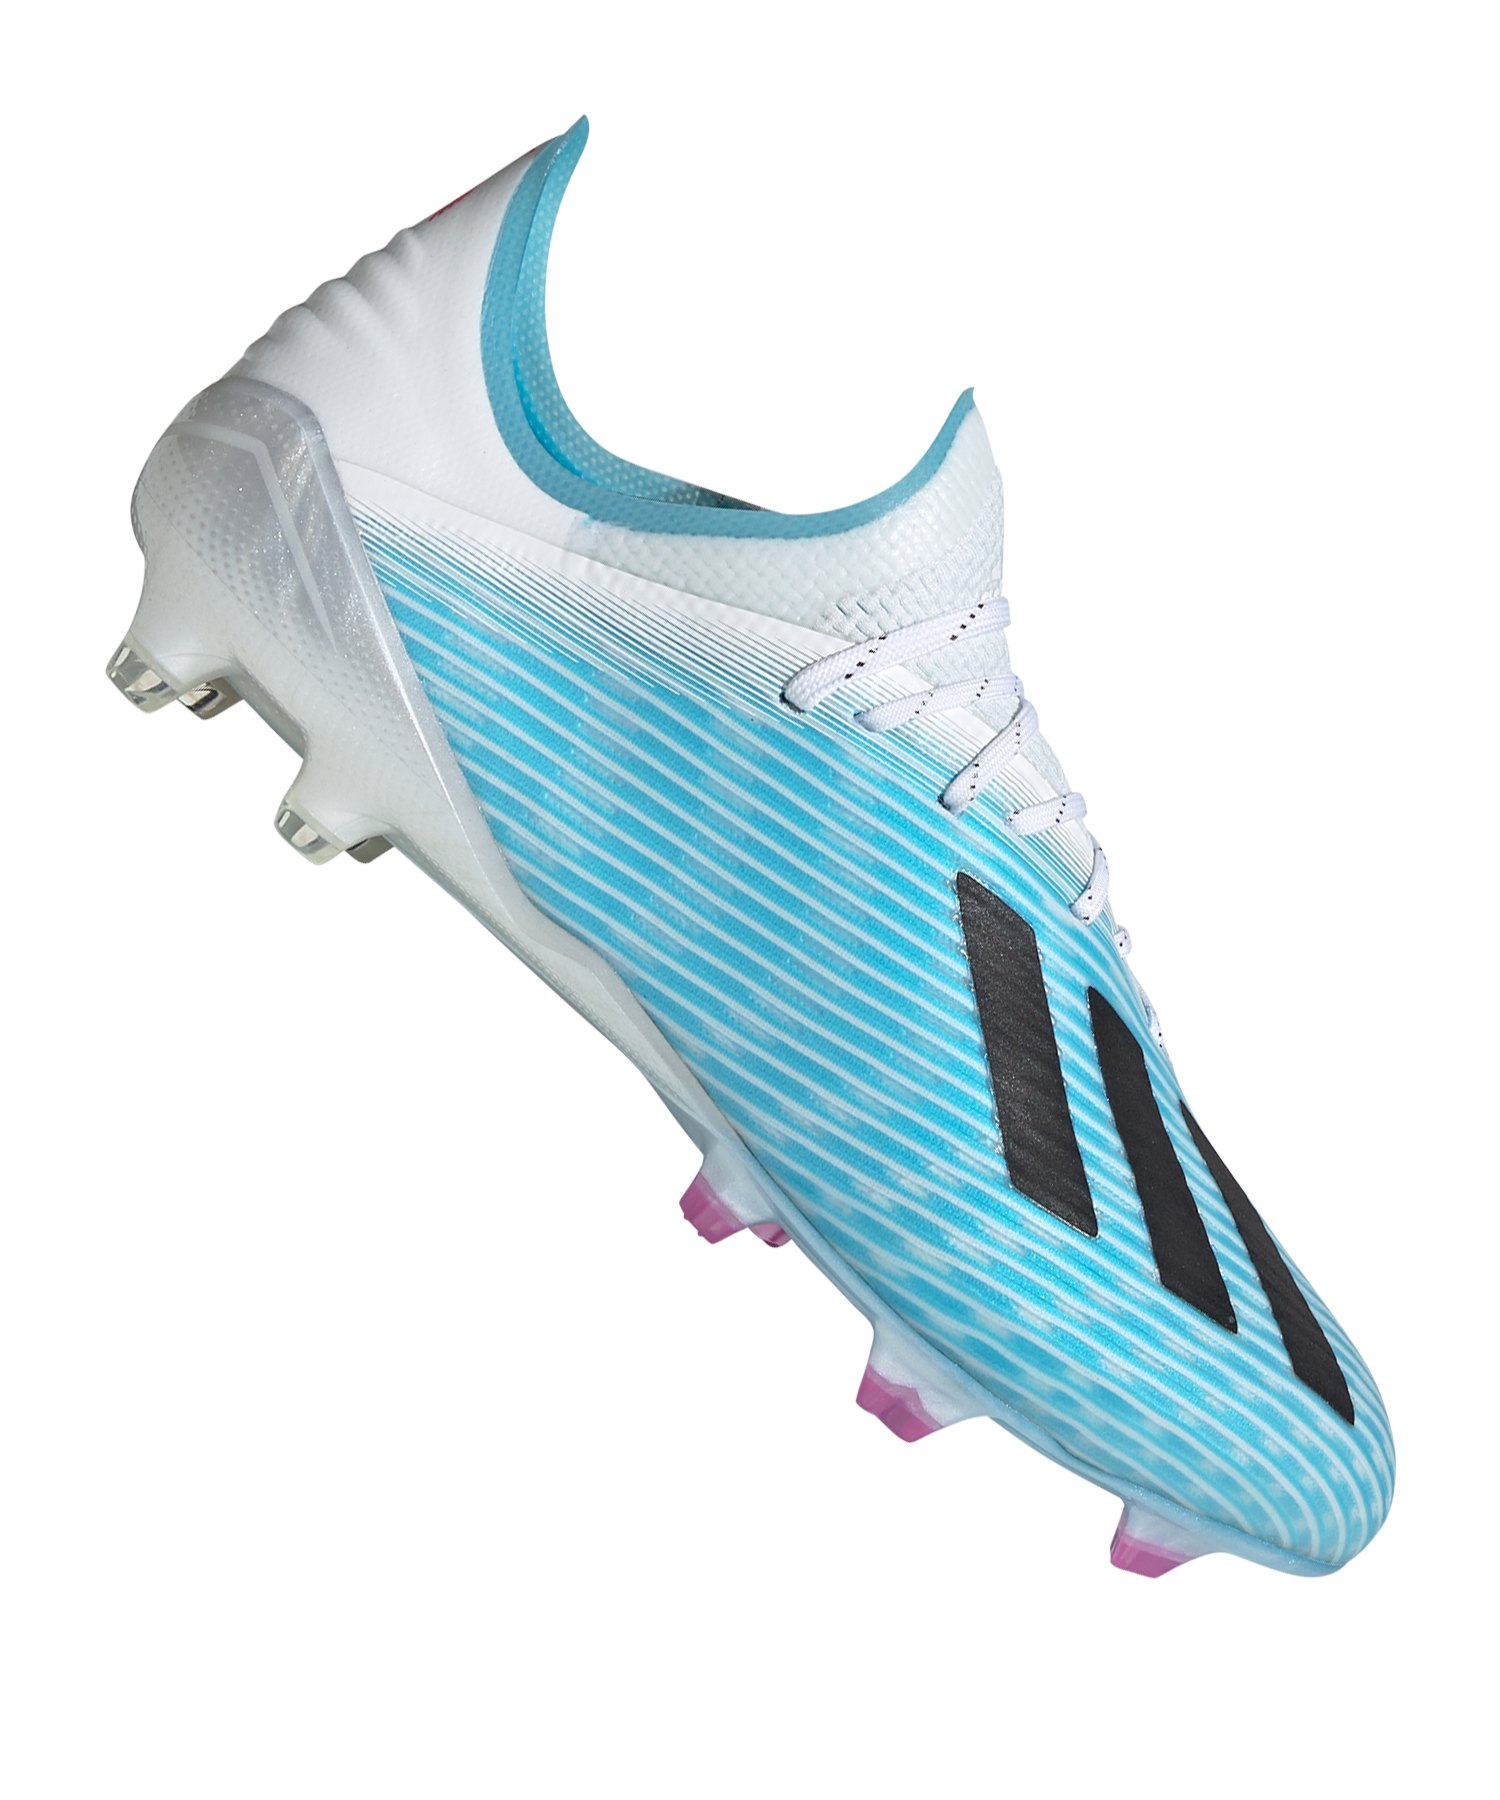 adidas schuh air türkis blau